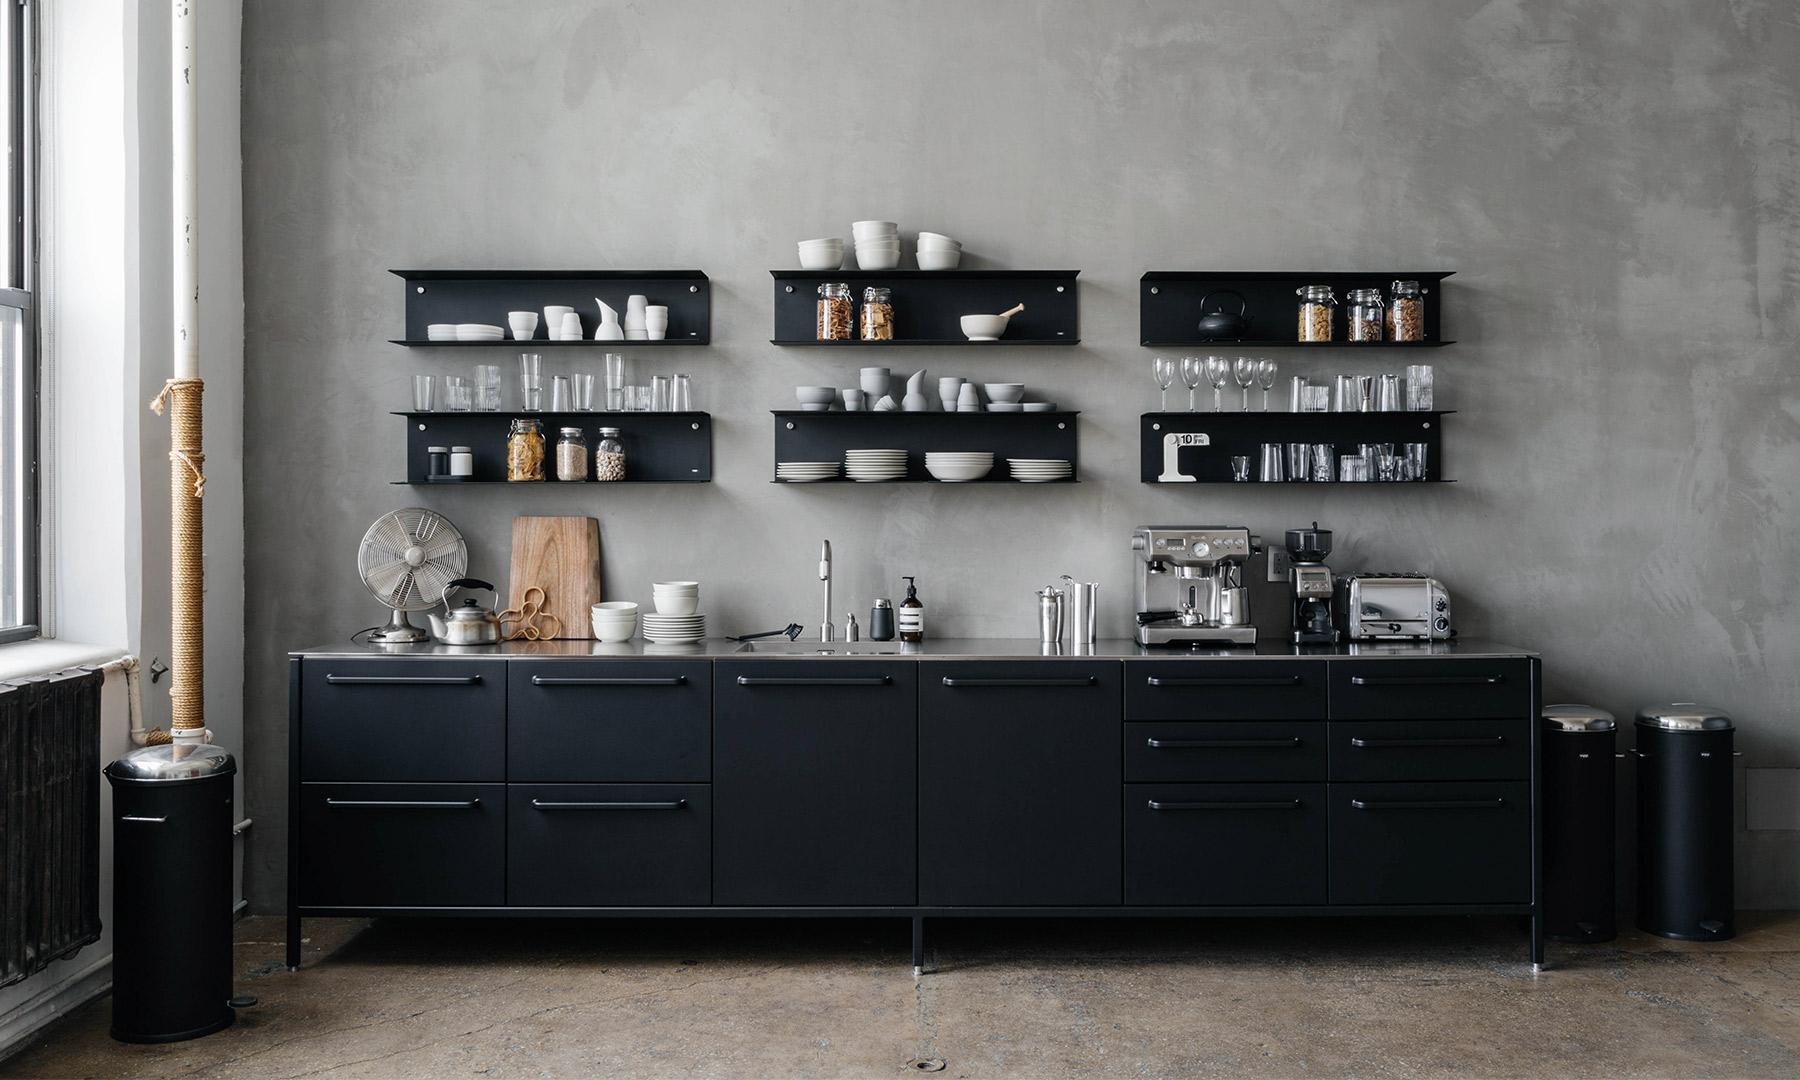 varick-st-kitchen-vipp-1_0_1.jpg